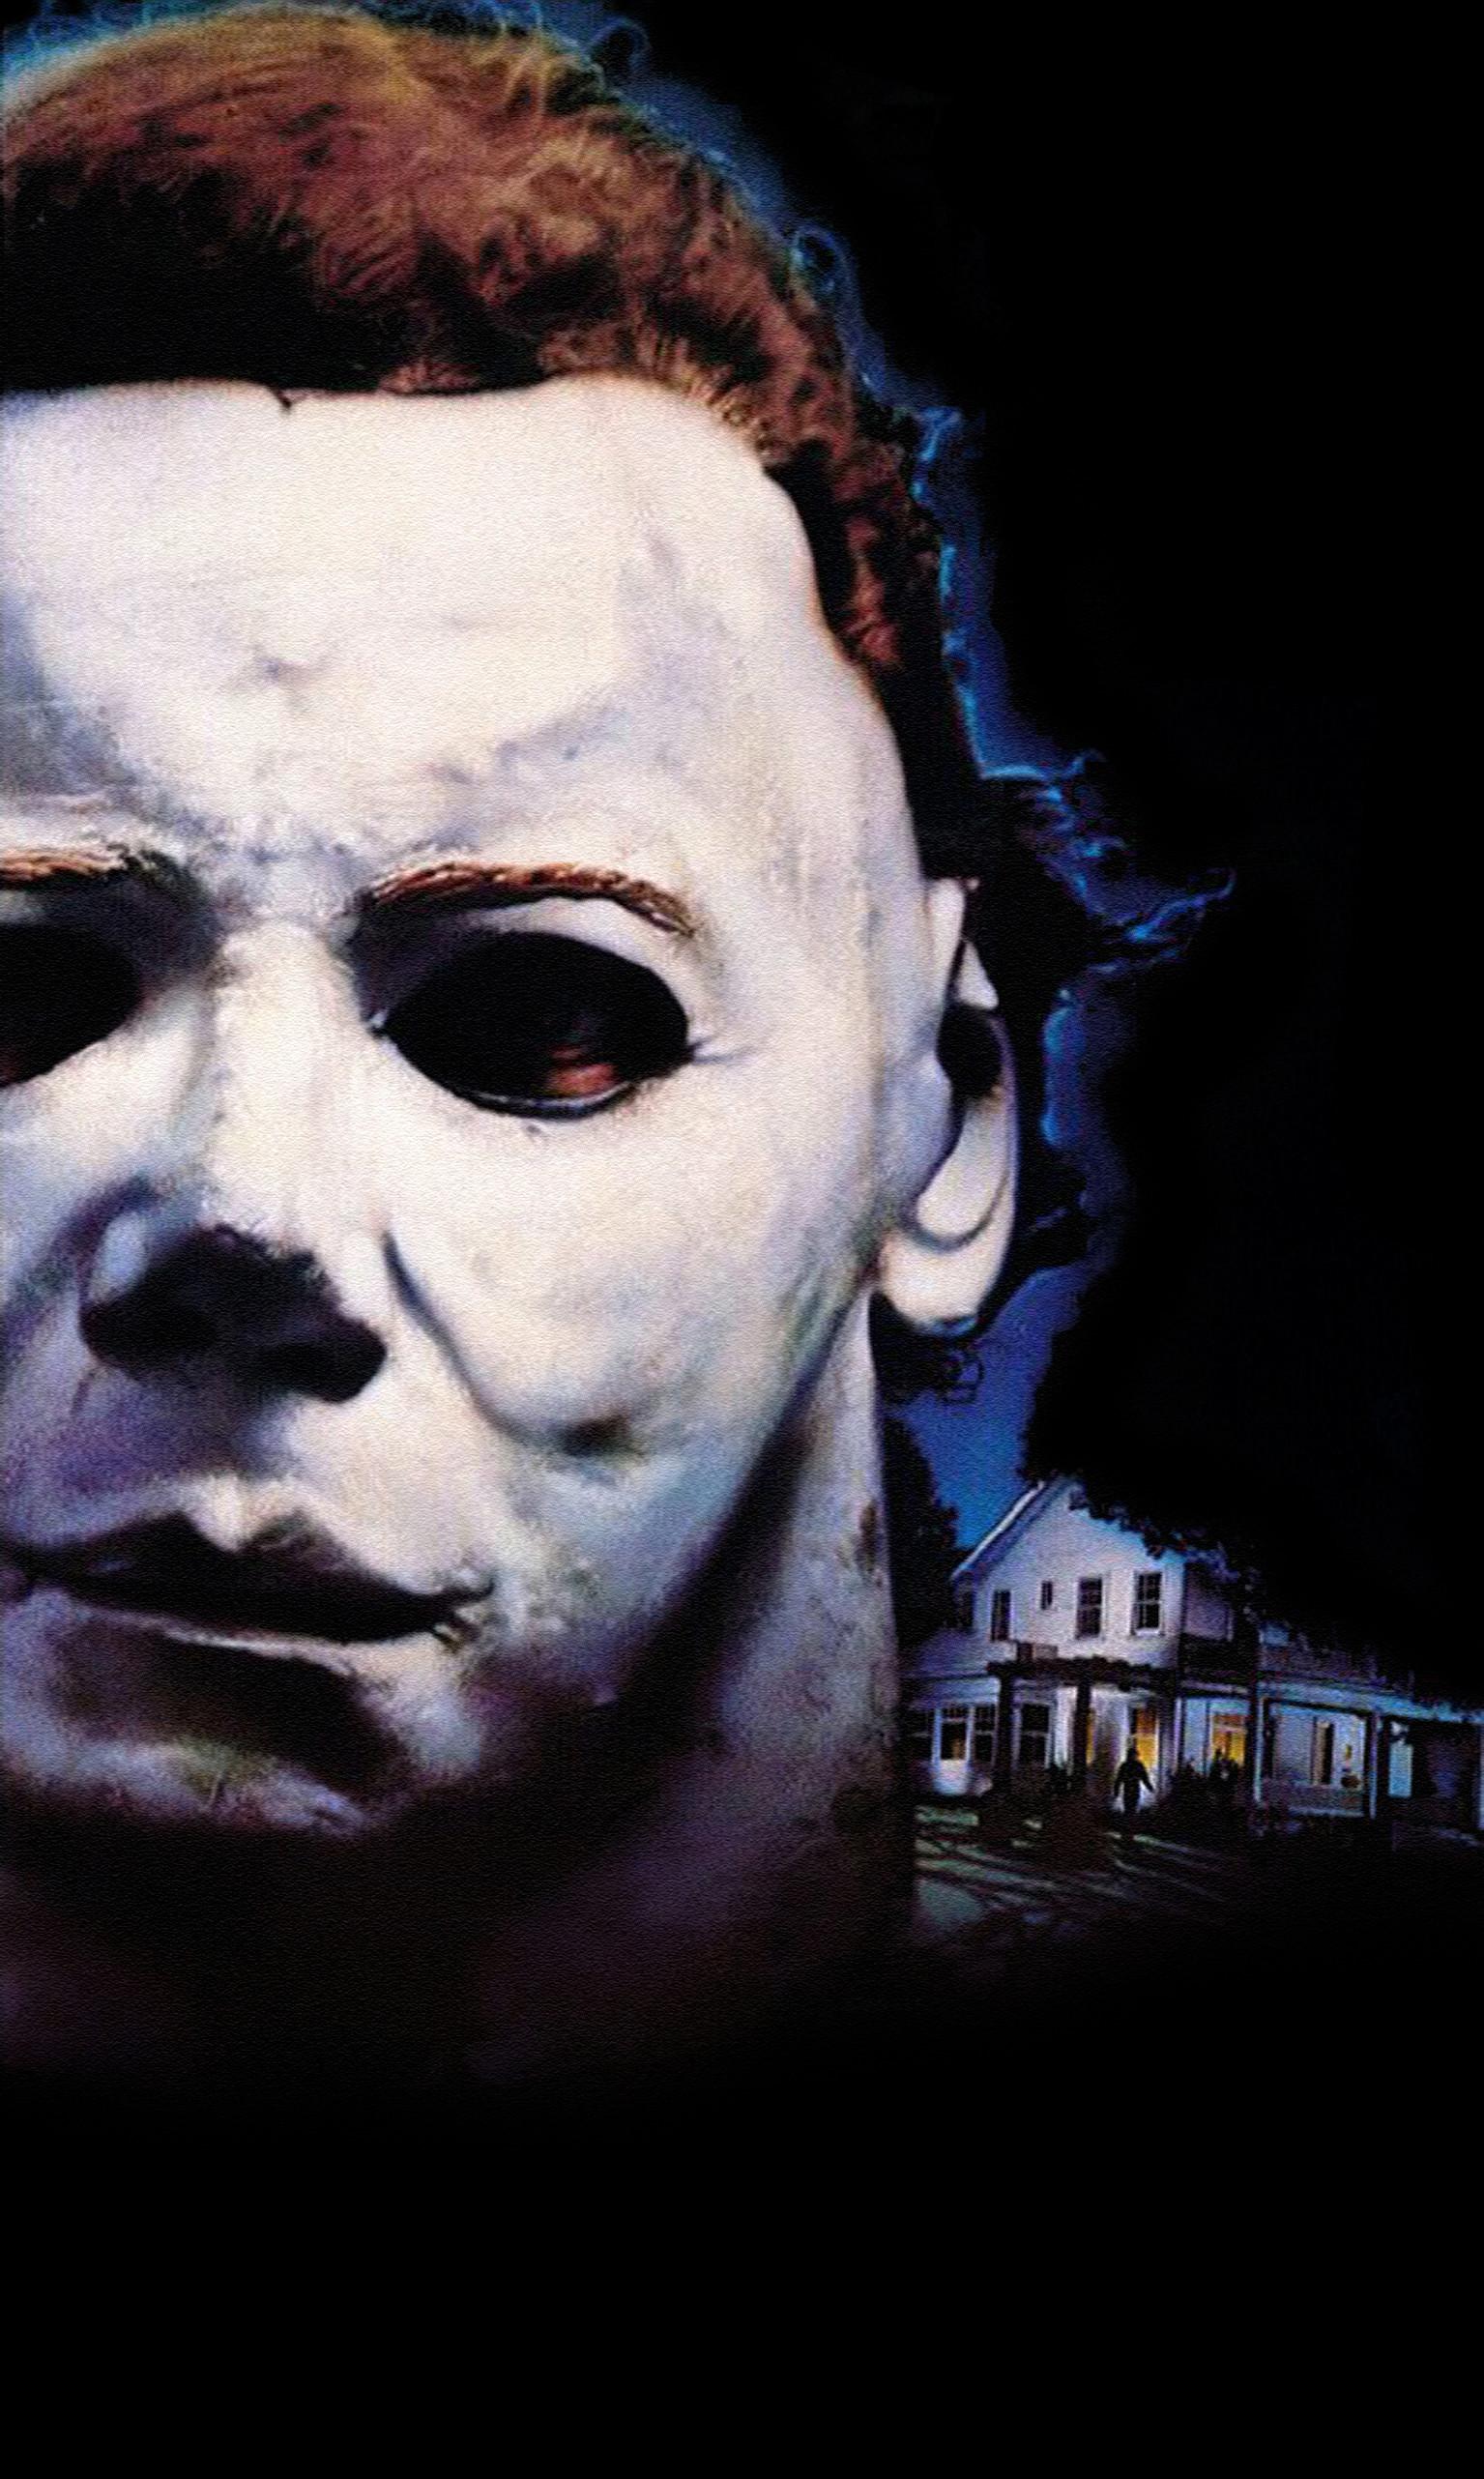 Halloween Phone Wallpapers 73 Images